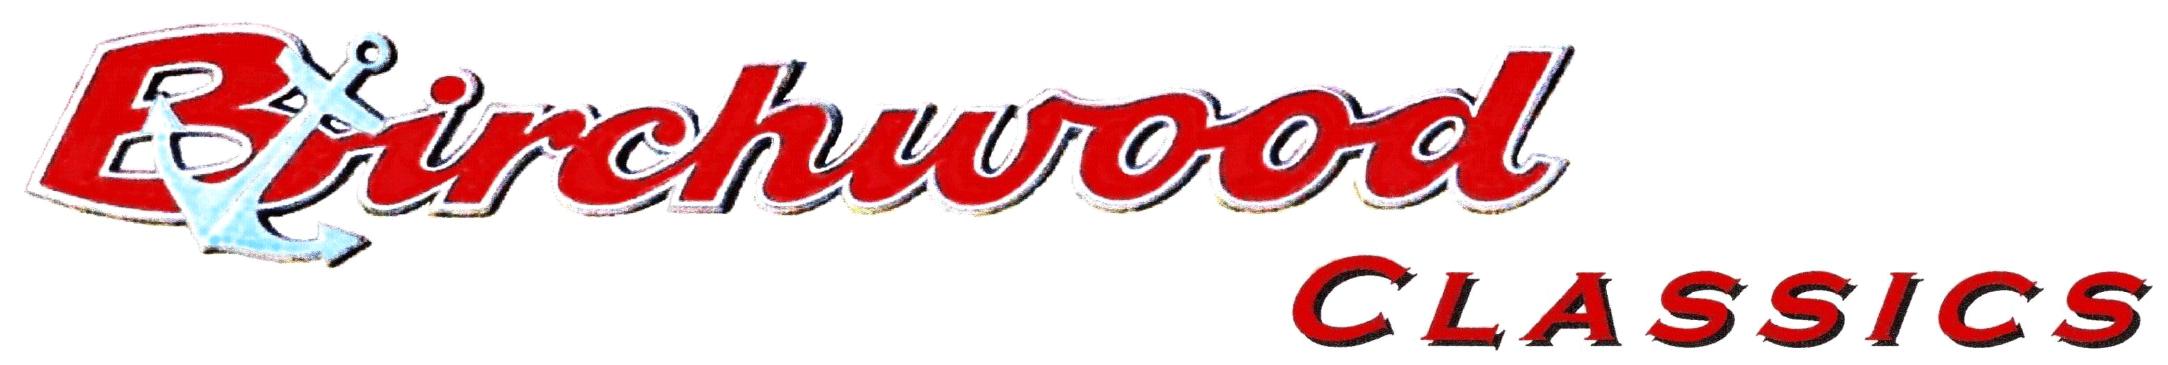 Birchwood-Classics-logo-22-July-2020